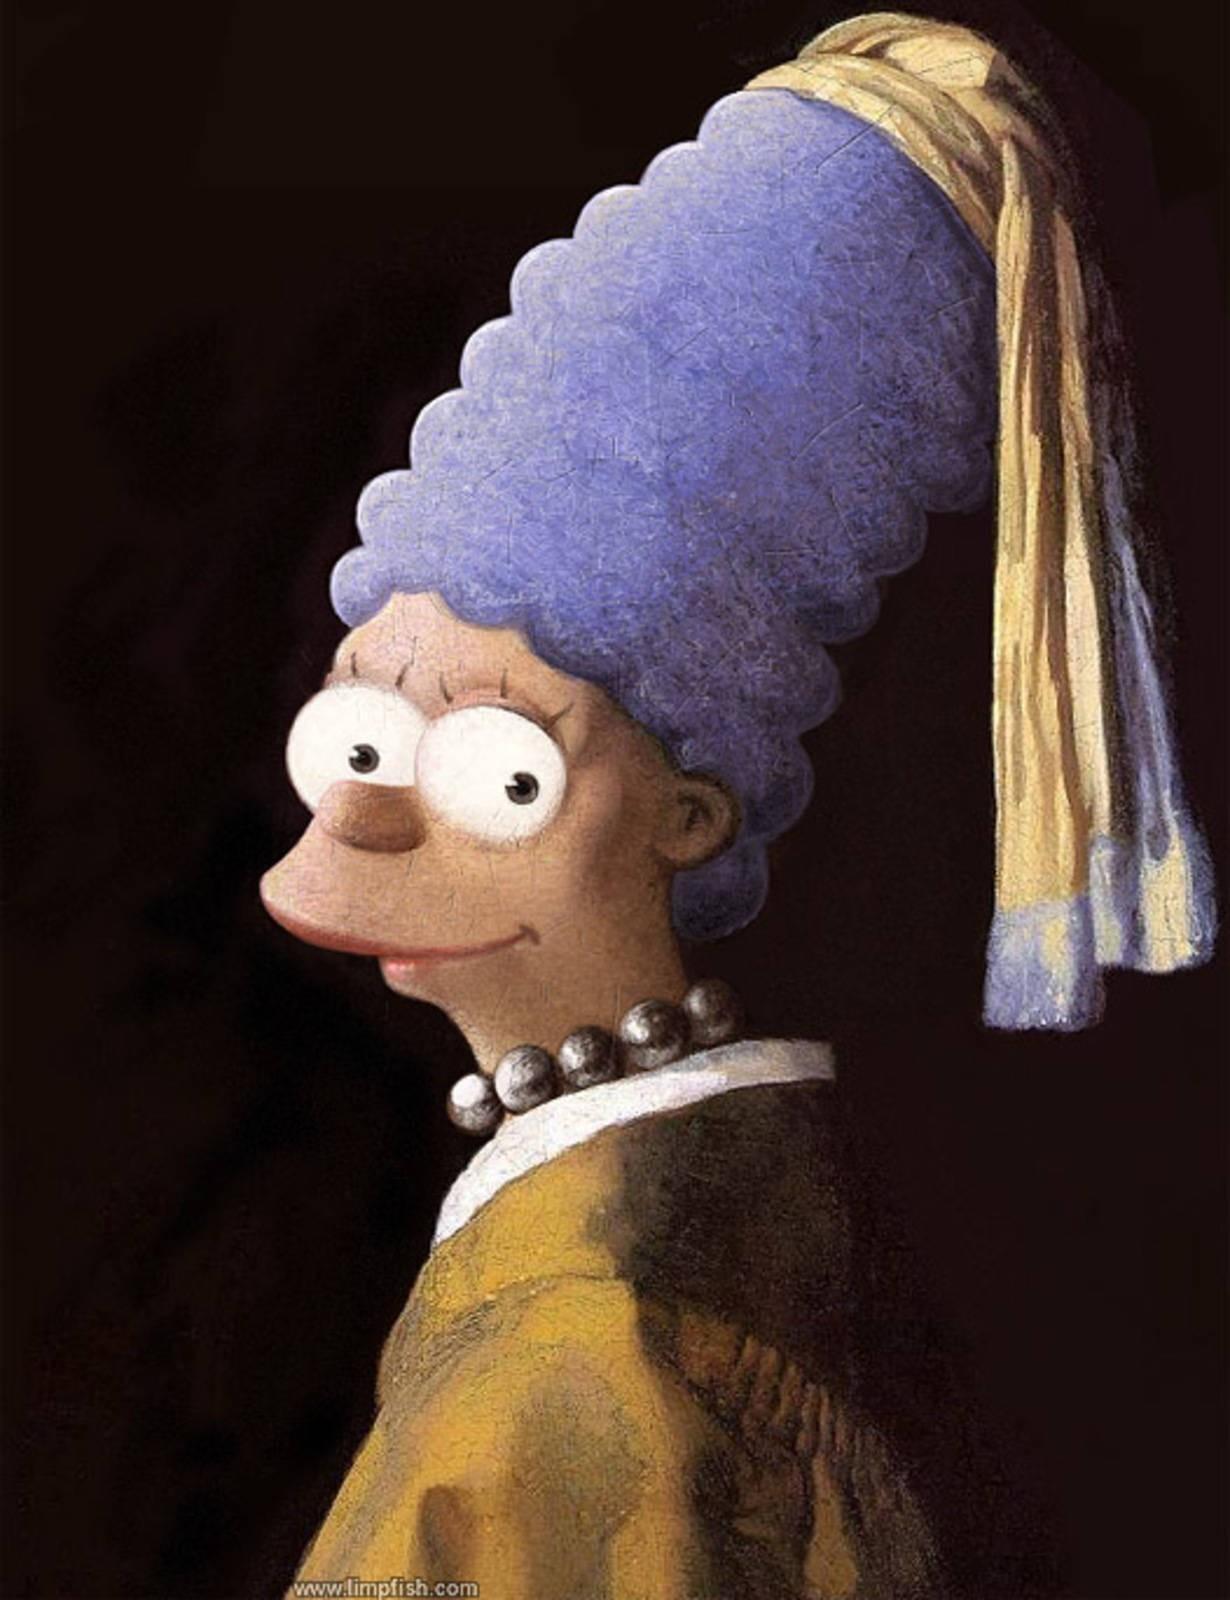 Marge Simpson, David Limpfish, 2009.